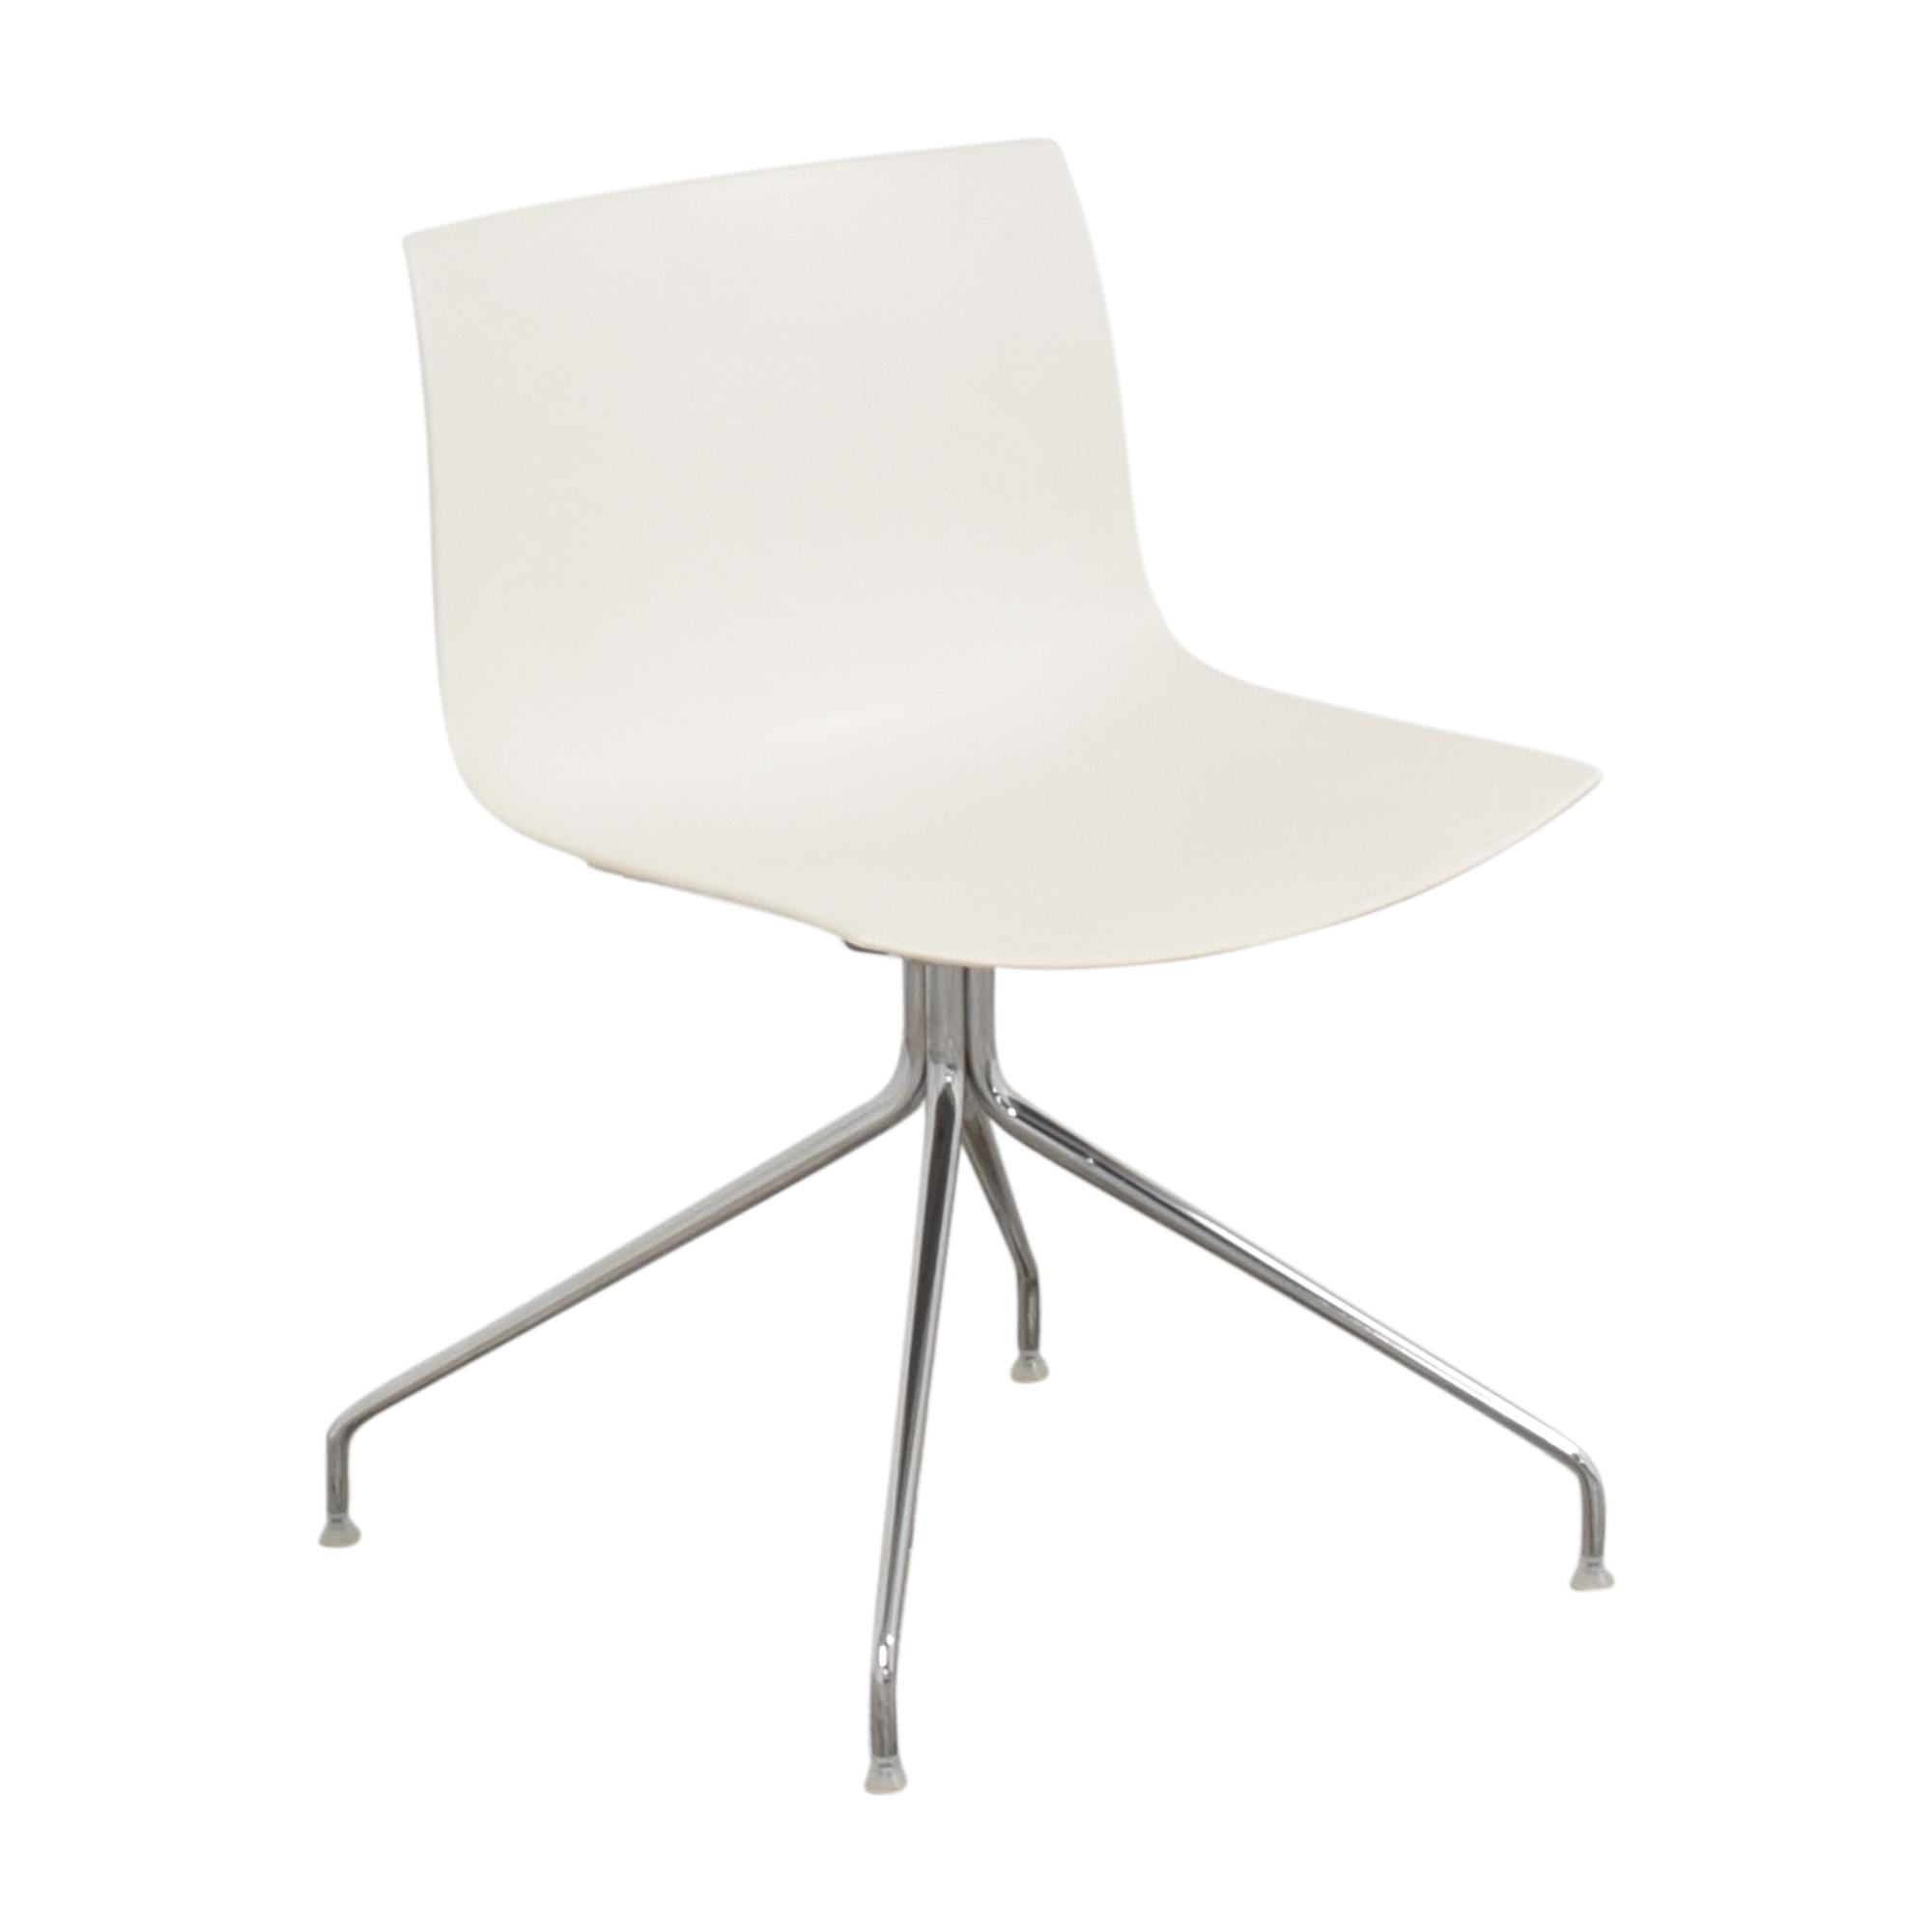 buy Arper Catifa 46 Trestle Swivel Chair Arper Chairs